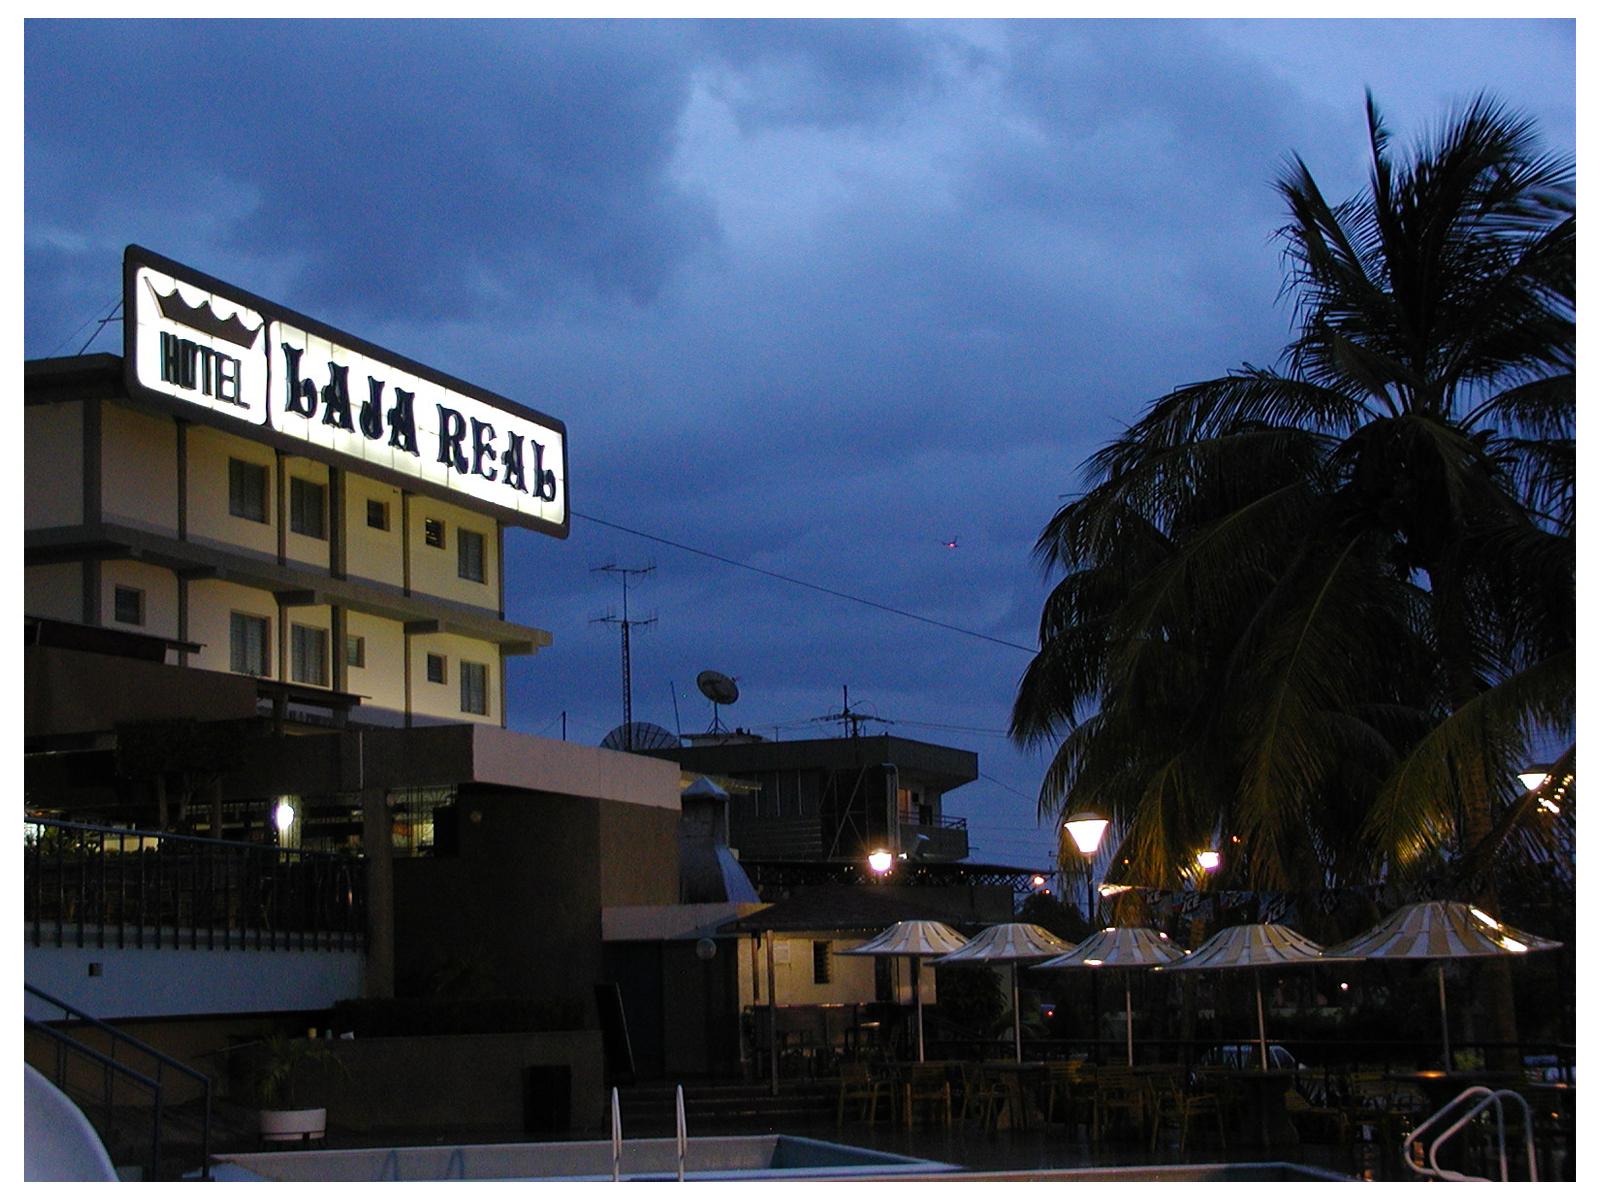 Hotel Laja Real, Bolivar, Venezuela